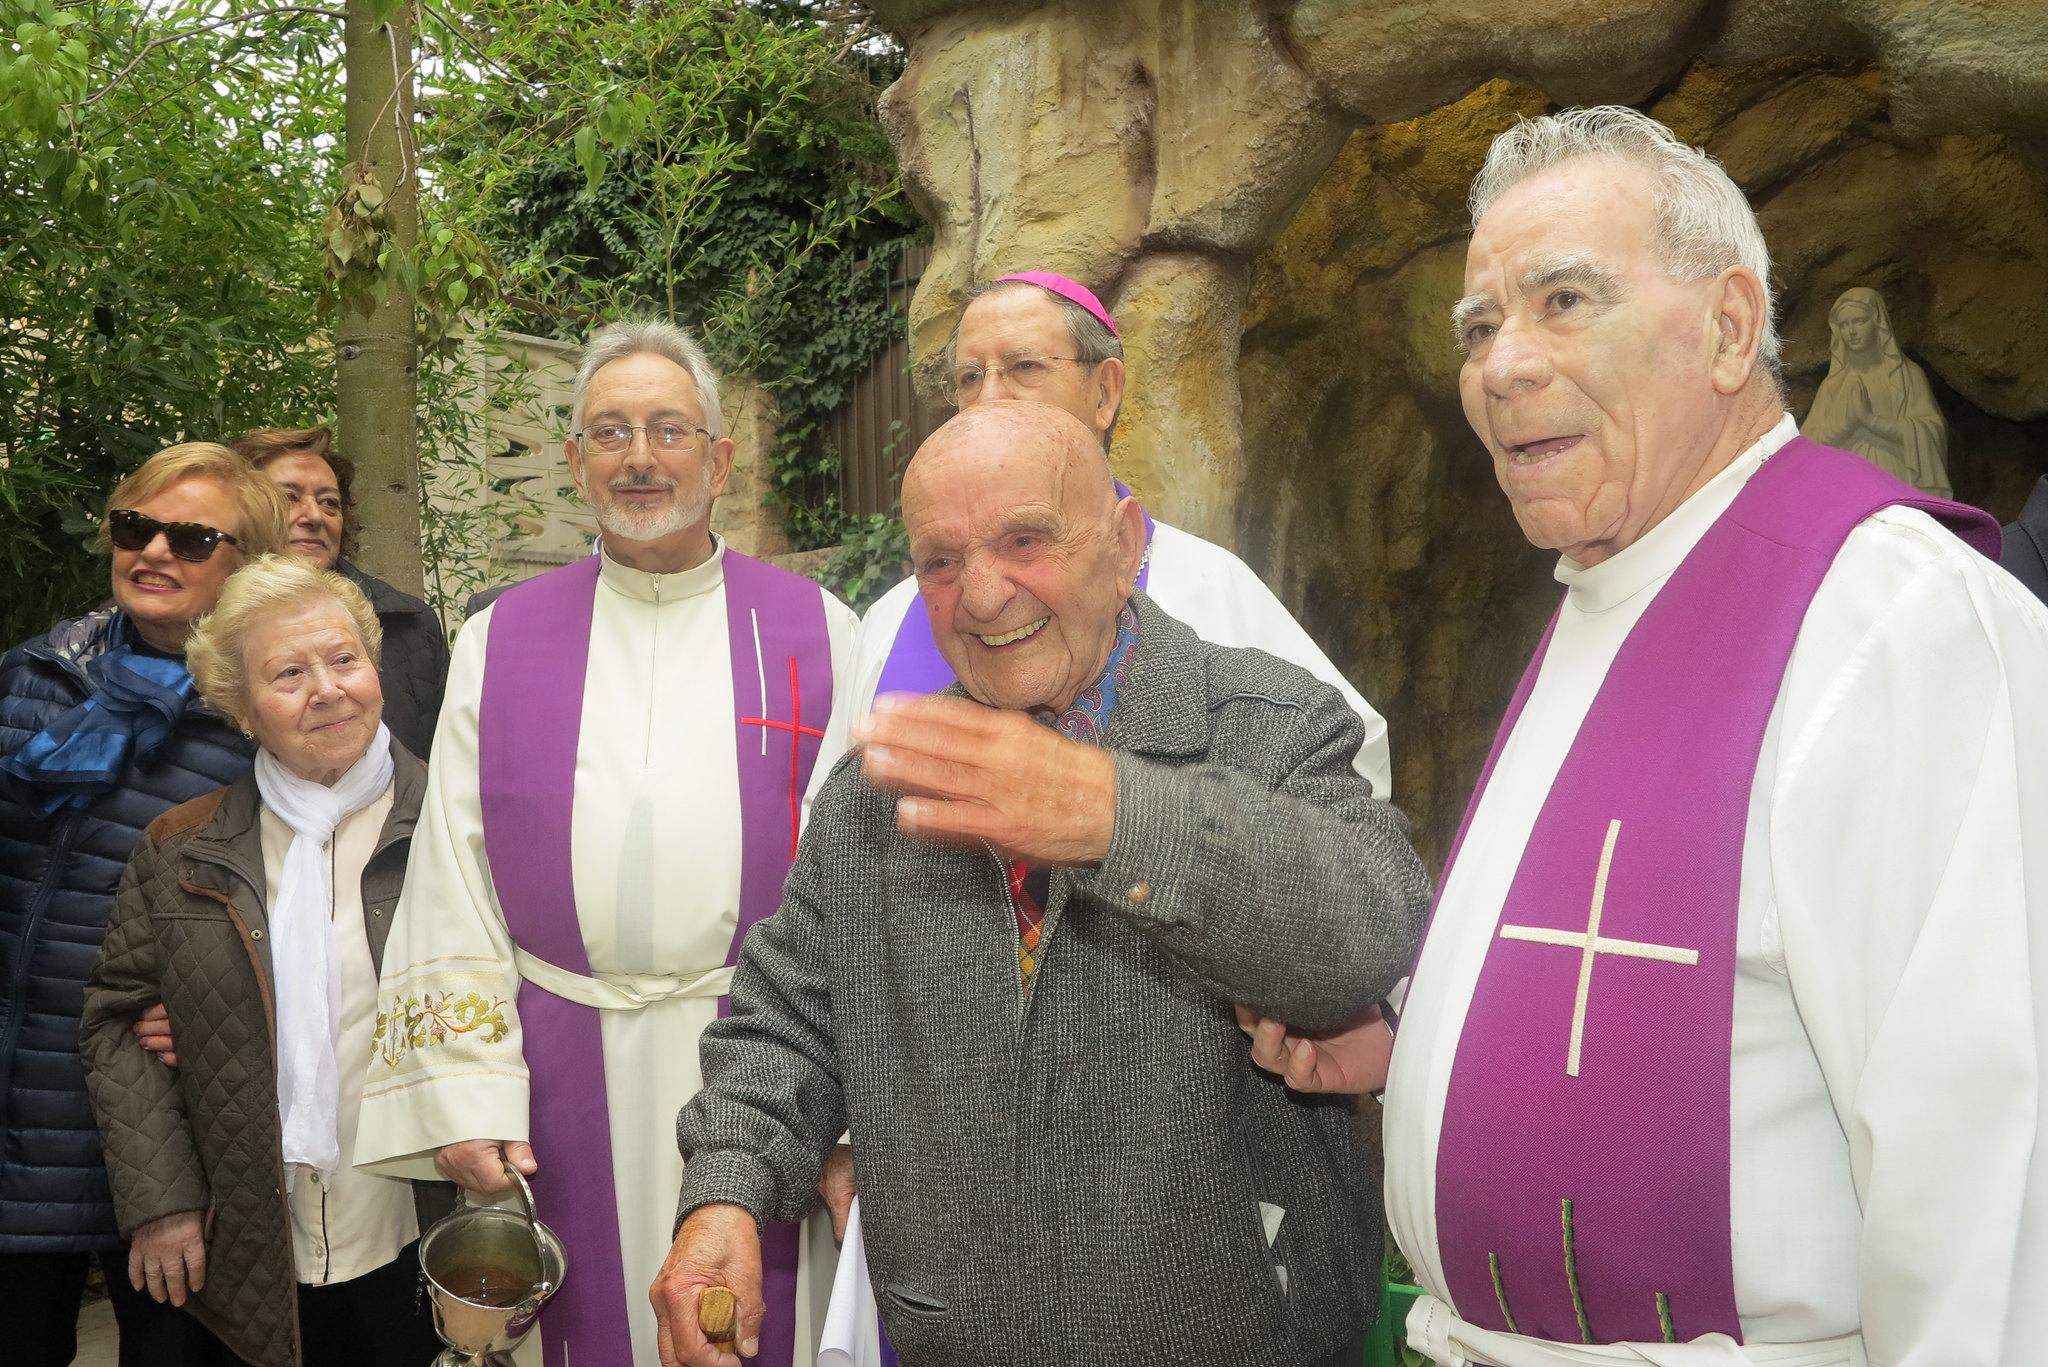 (2016-02-13) - Inauguración Virgen de Lourdes, La Molineta - Archivo La Molineta 2 (63)